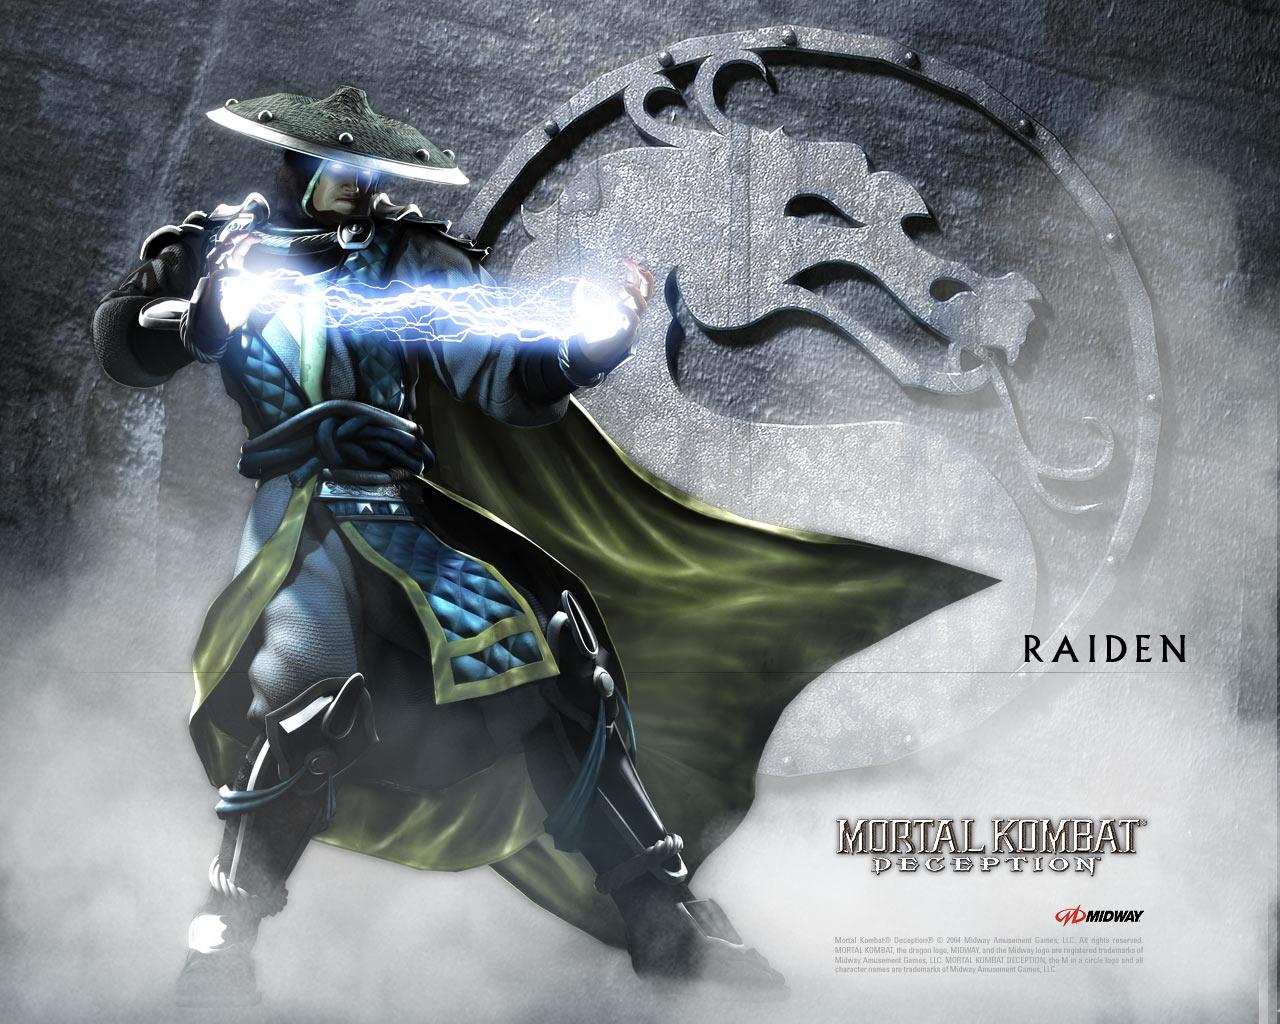 http://3.bp.blogspot.com/_LyUeH34N__U/S8SDIx89F-I/AAAAAAAAAPg/j7auGh0H2IA/s1600/Games_Raiden_MK_007147_.jpg